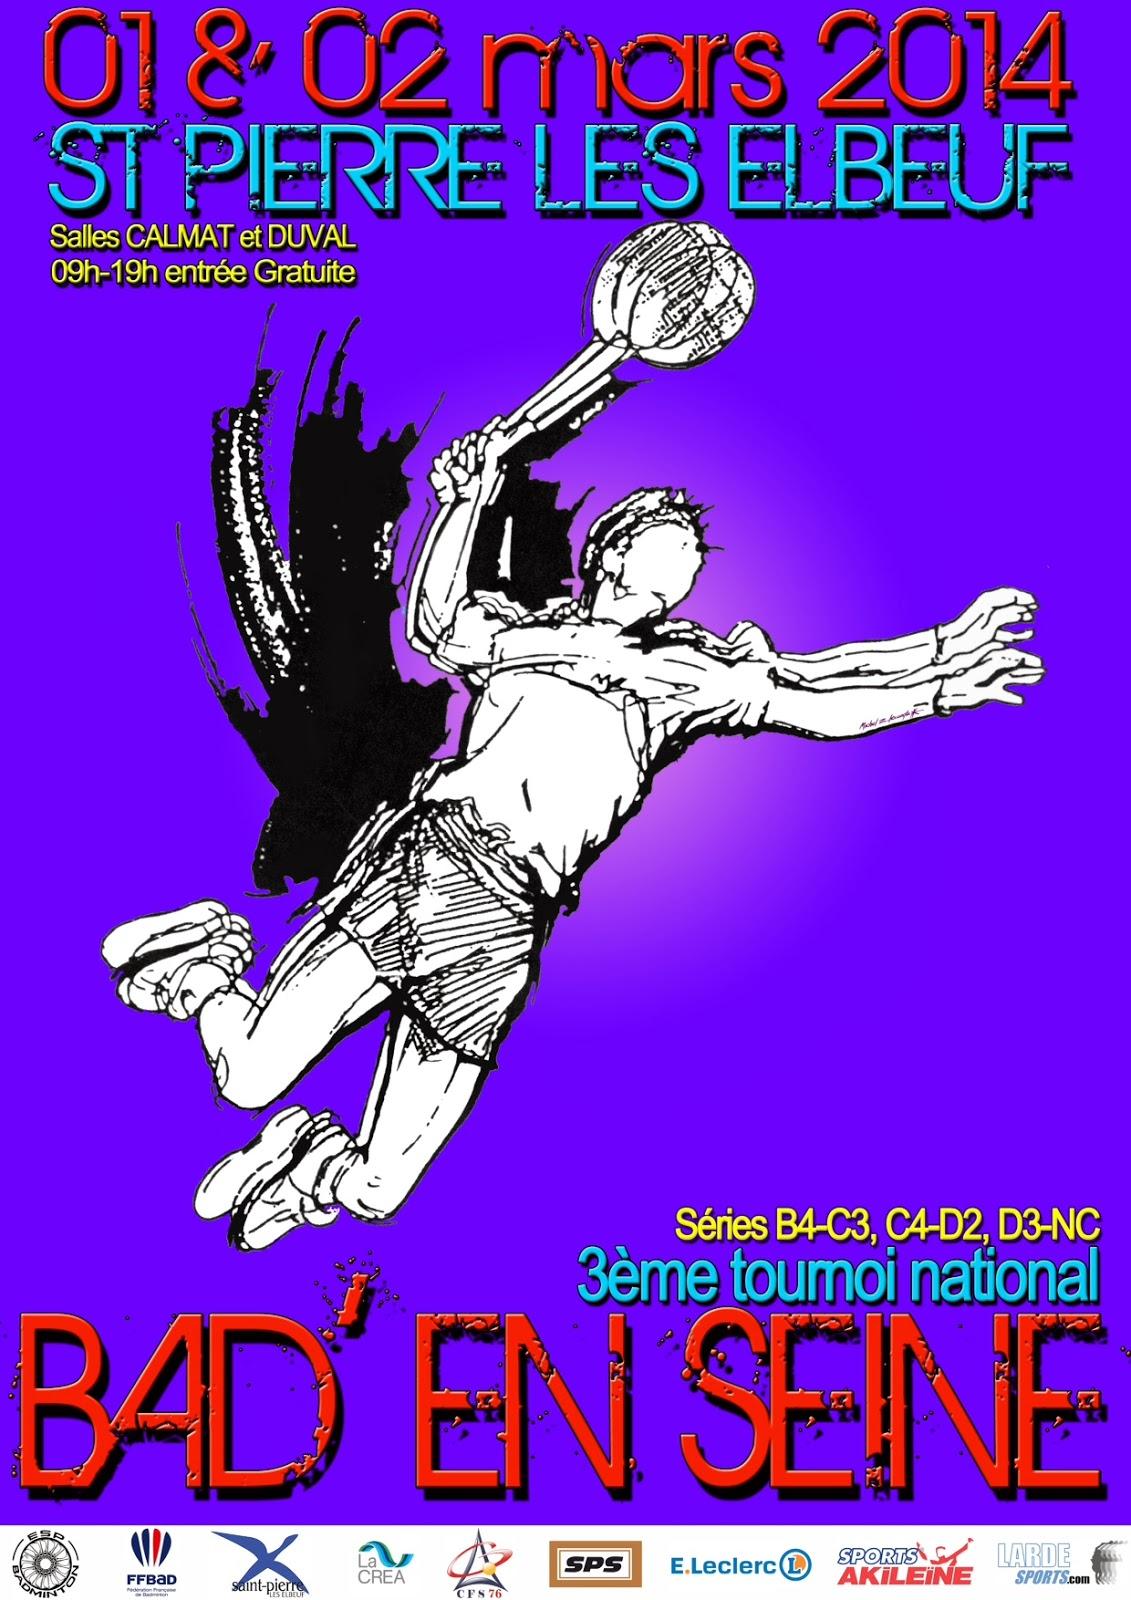 Ligue de haute normandie de badminton 3 me tournoi - Normandie garage st pierre les elbeuf ...